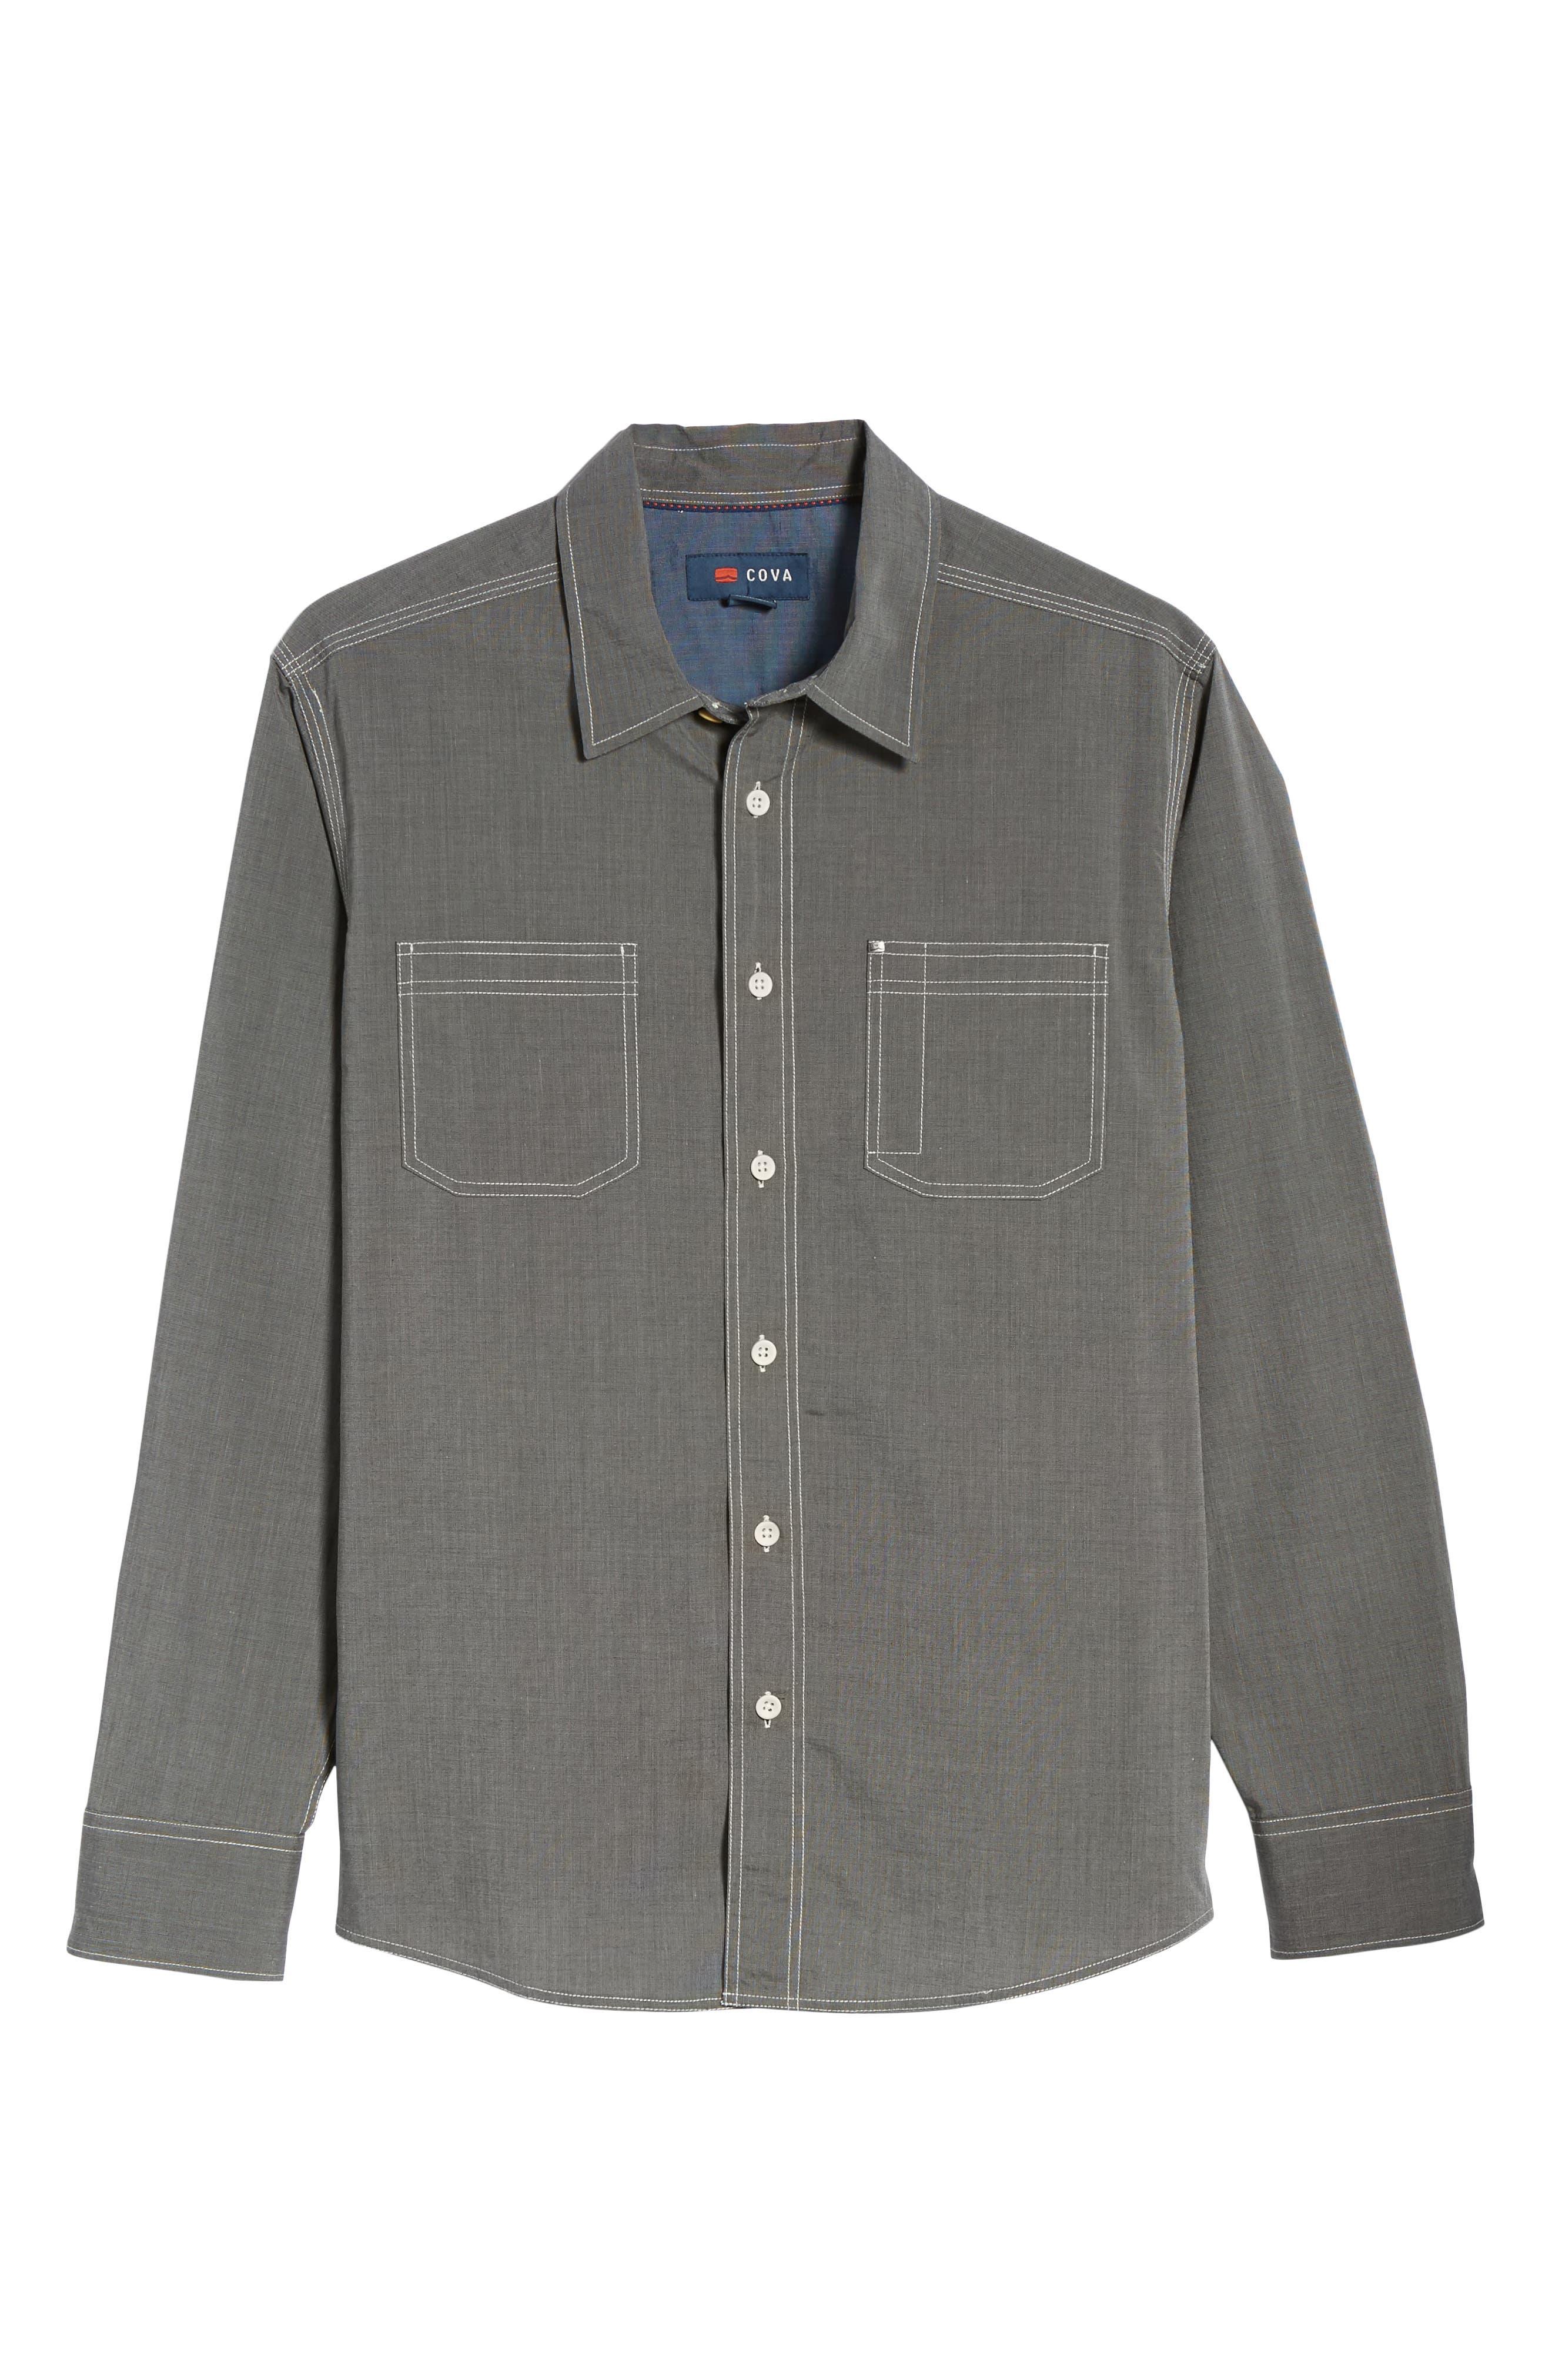 Seaside Regular Fit Sport Shirt,                             Alternate thumbnail 6, color,                             COAL